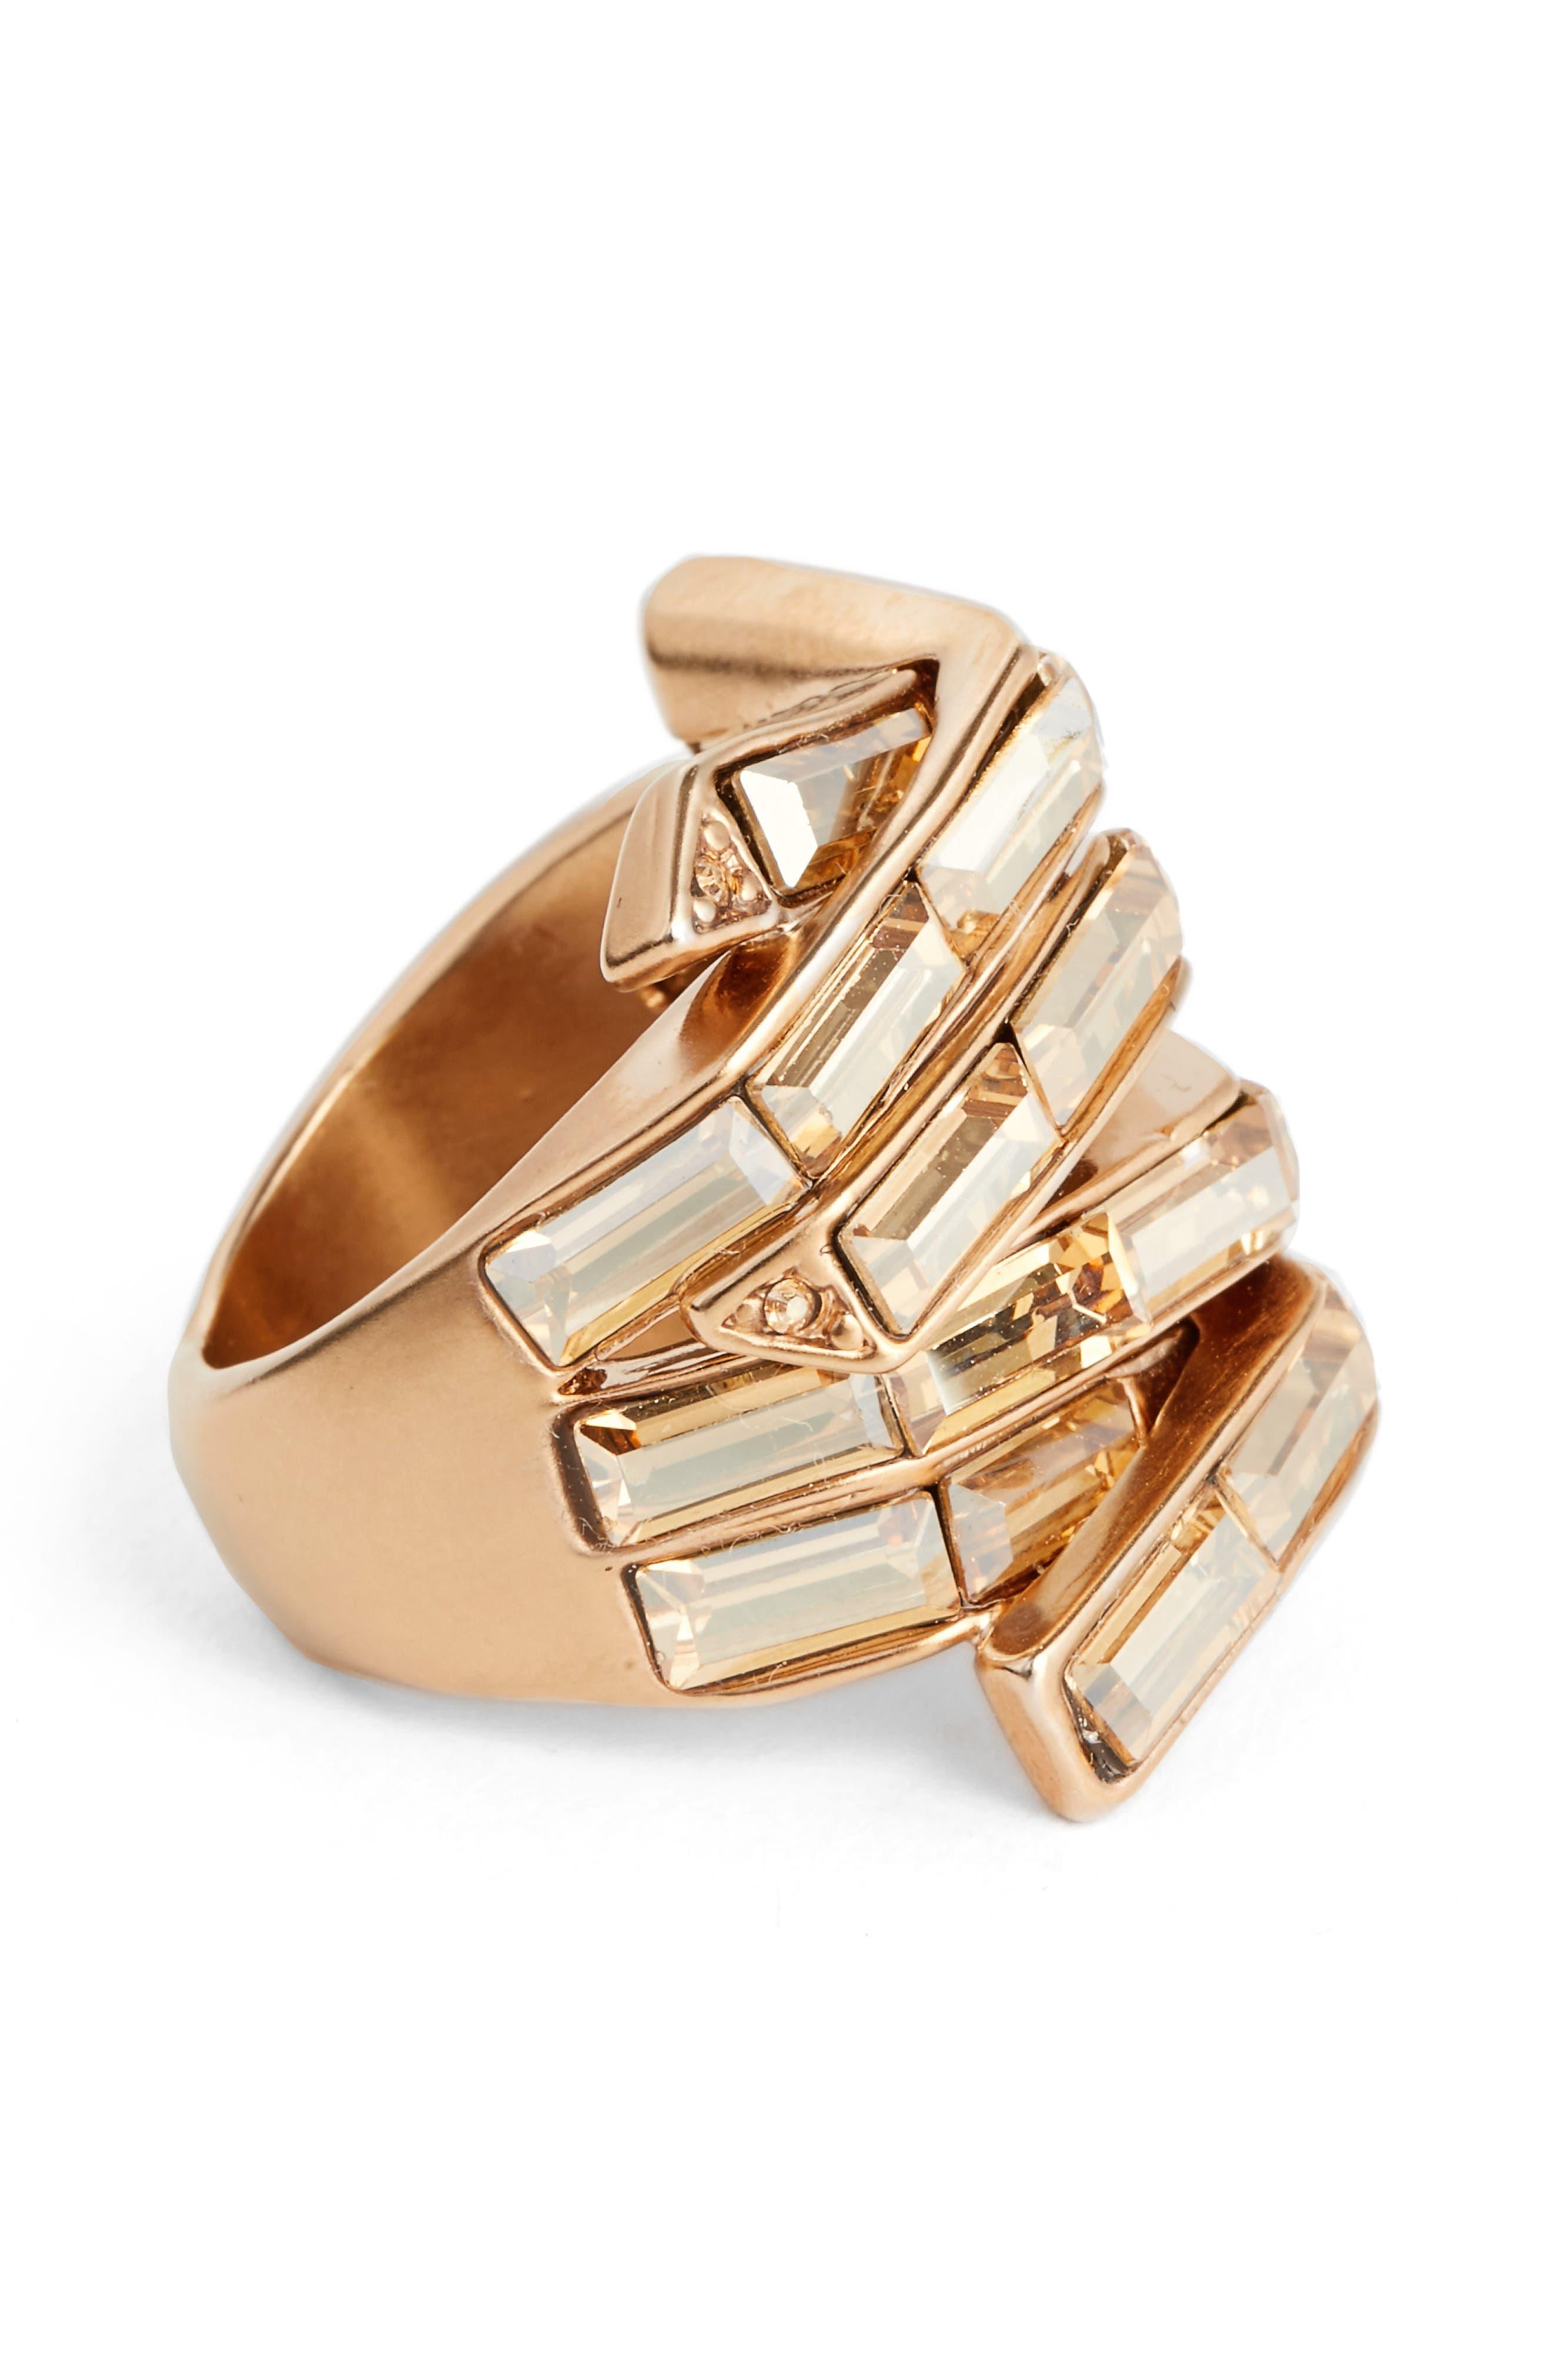 Swarovski Crystal Cocktail Ring,                             Alternate thumbnail 2, color,                             Rose Gold